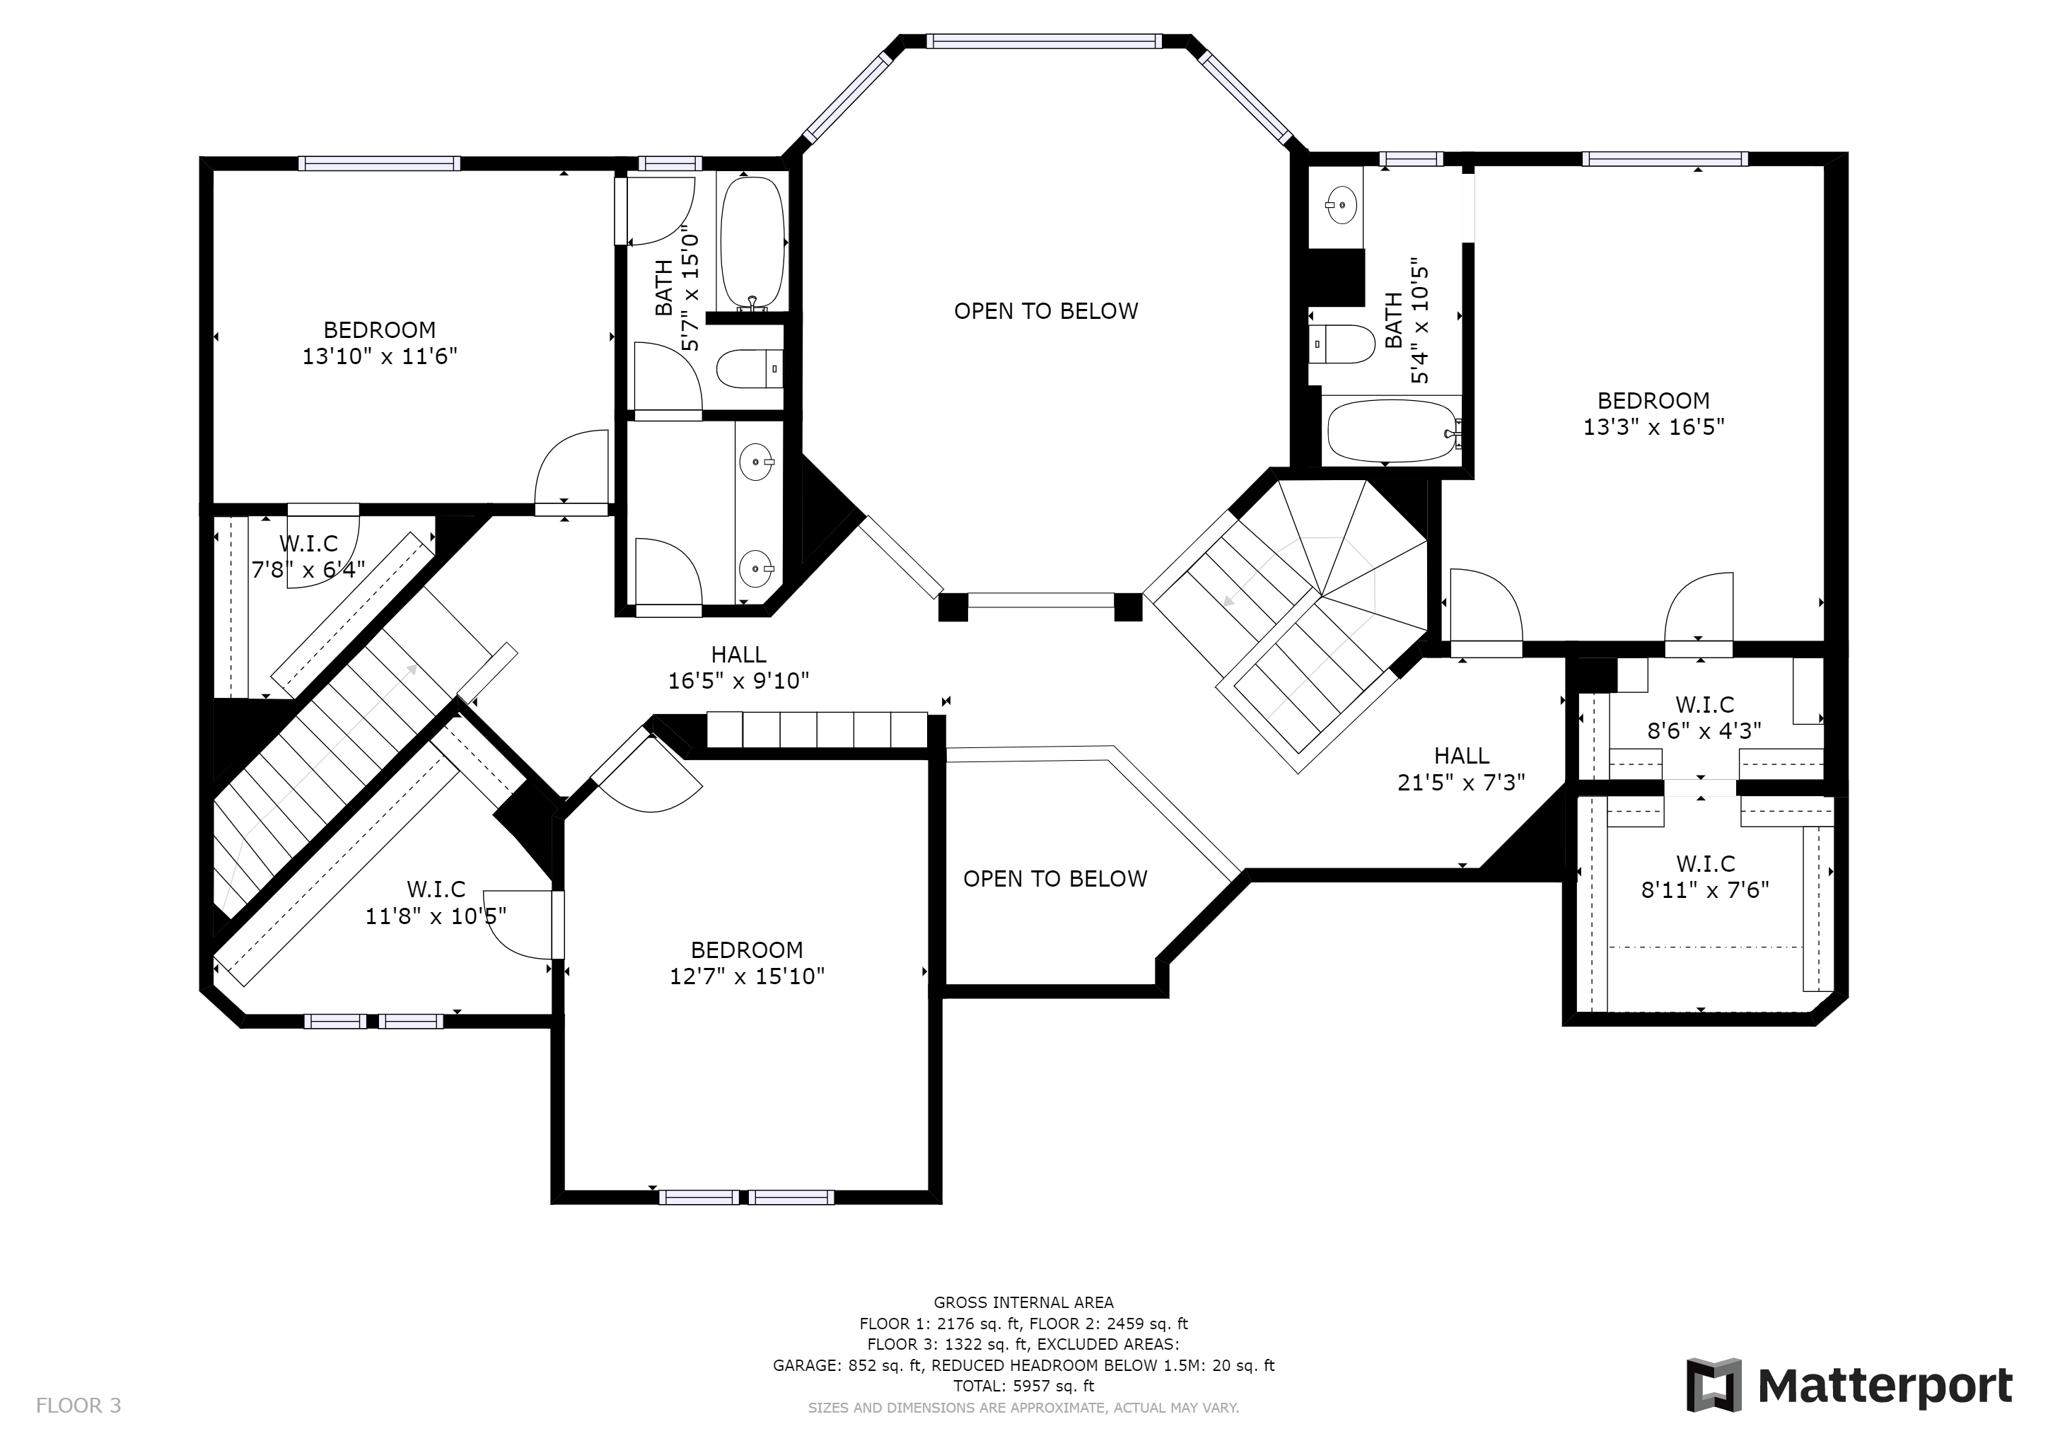 Floorplan - Upper Level